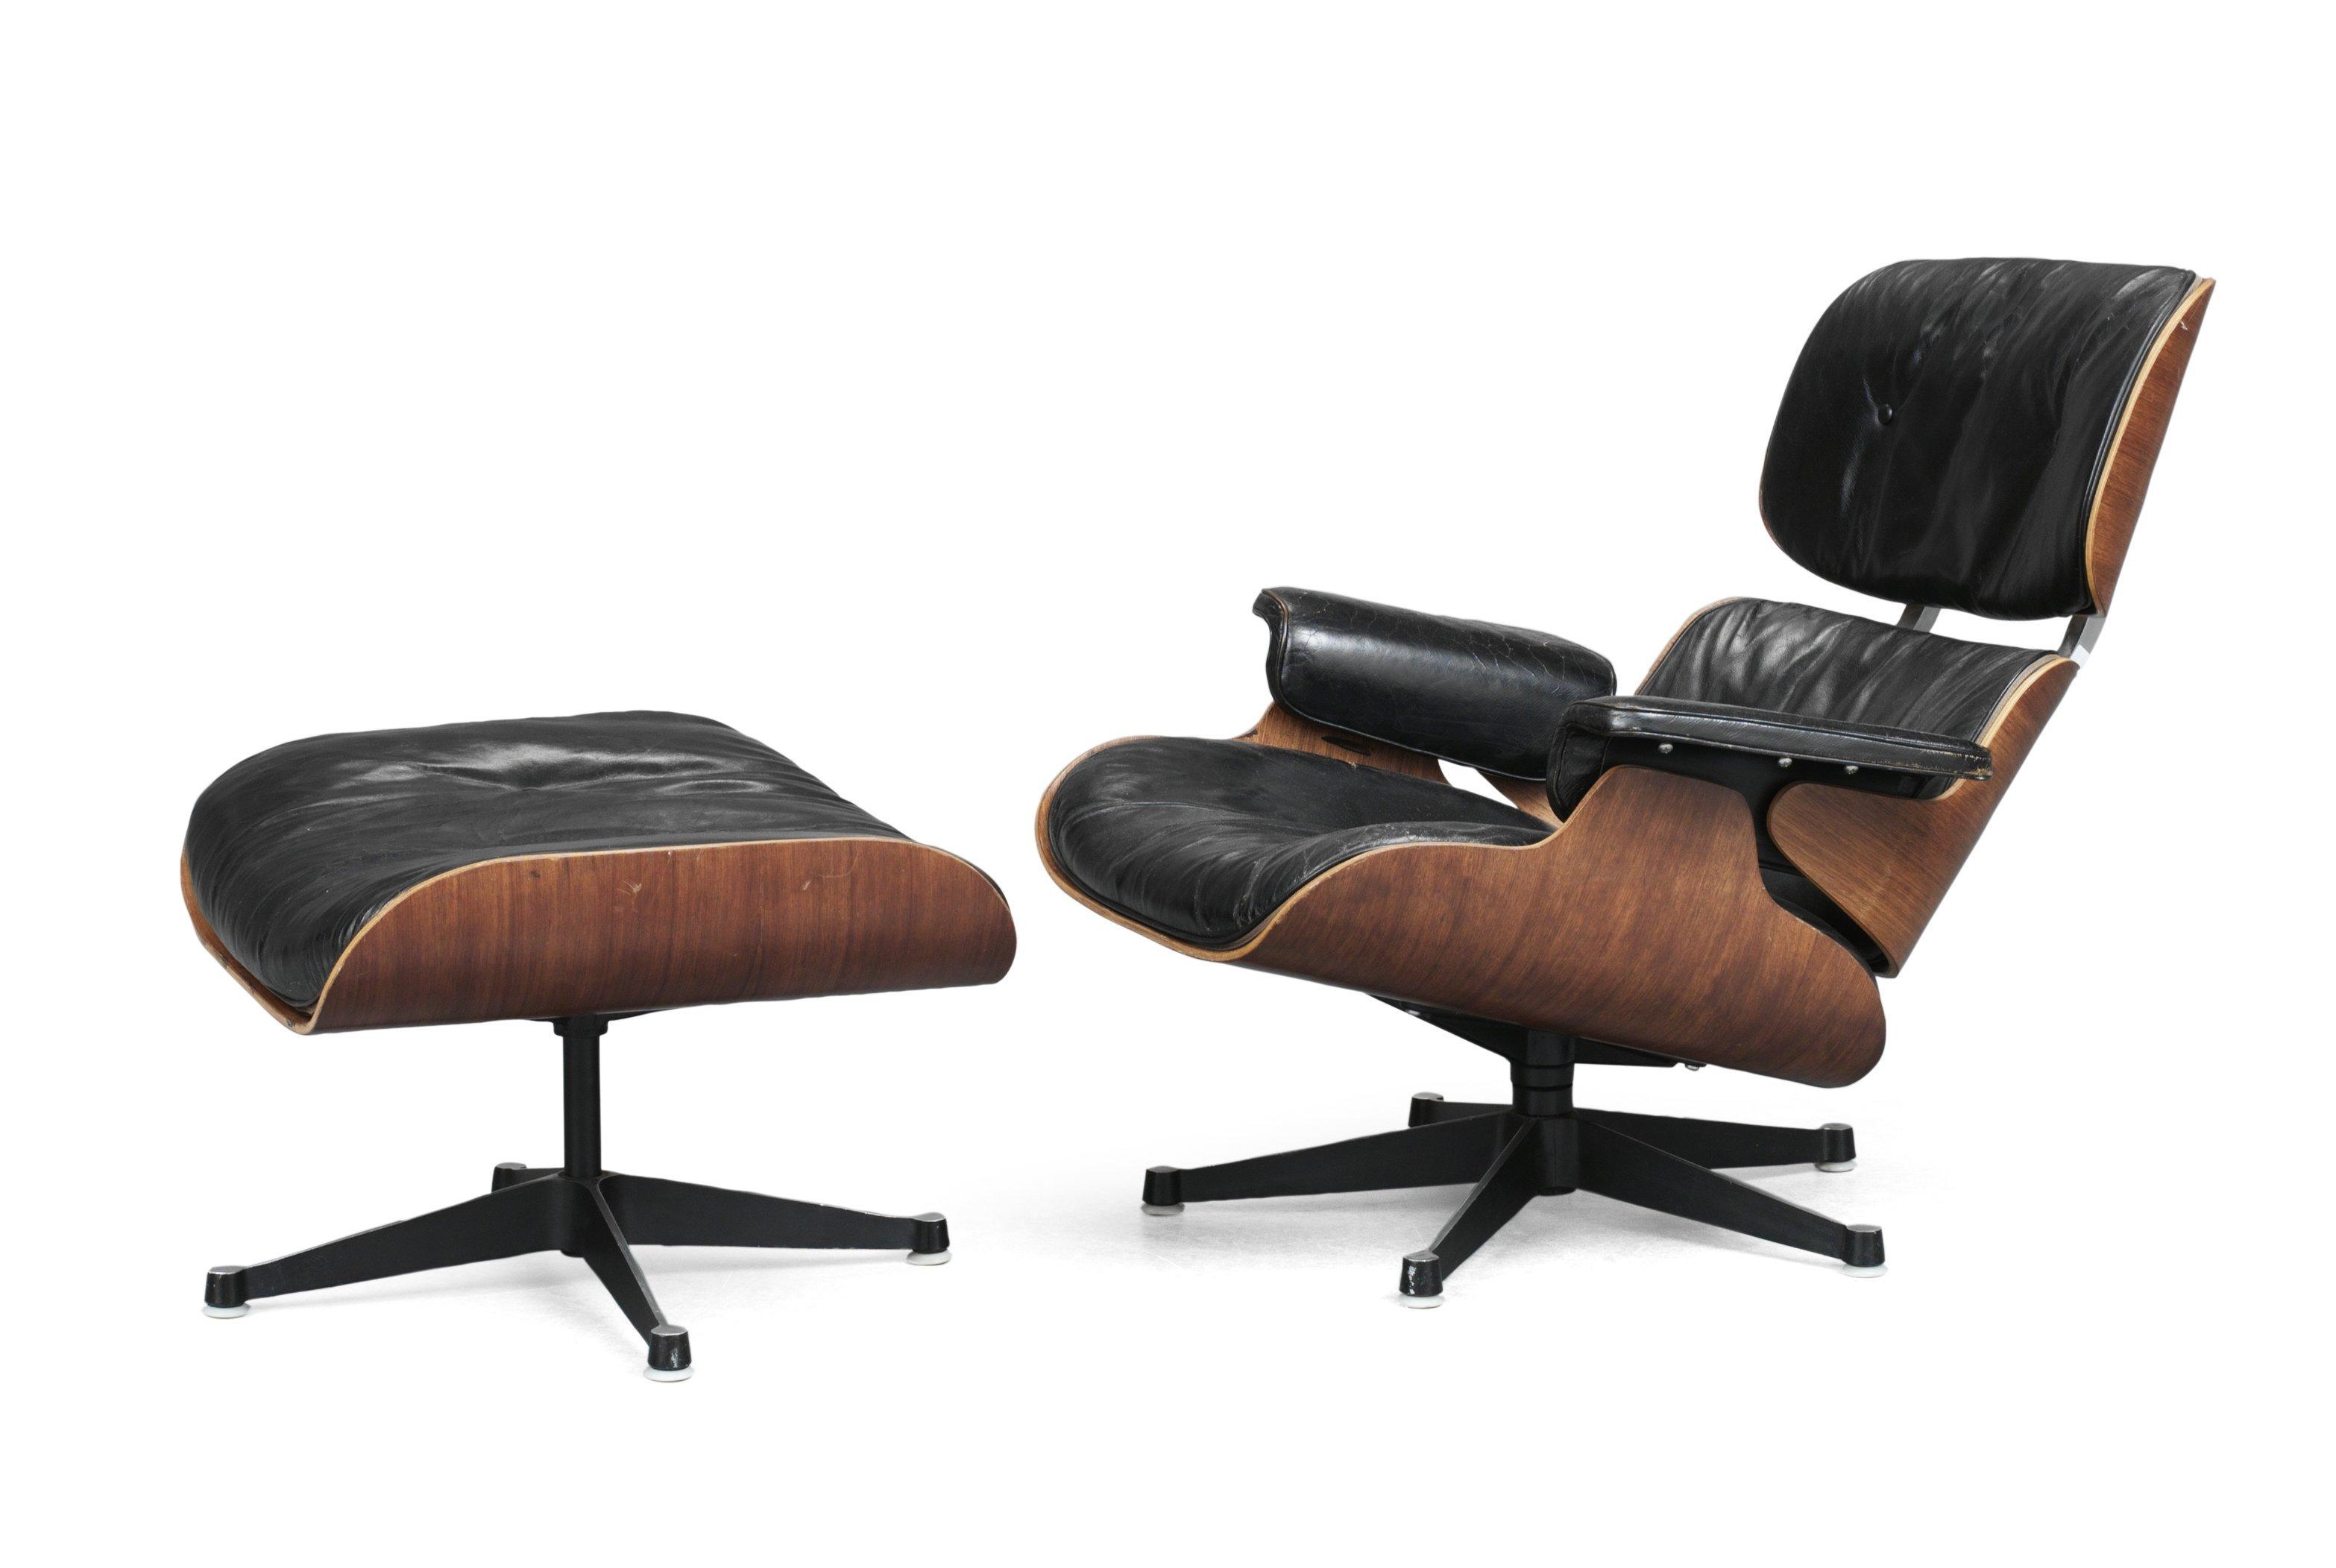 Eames Lounge Stoel : Eames lounge chair ottoman uncrate